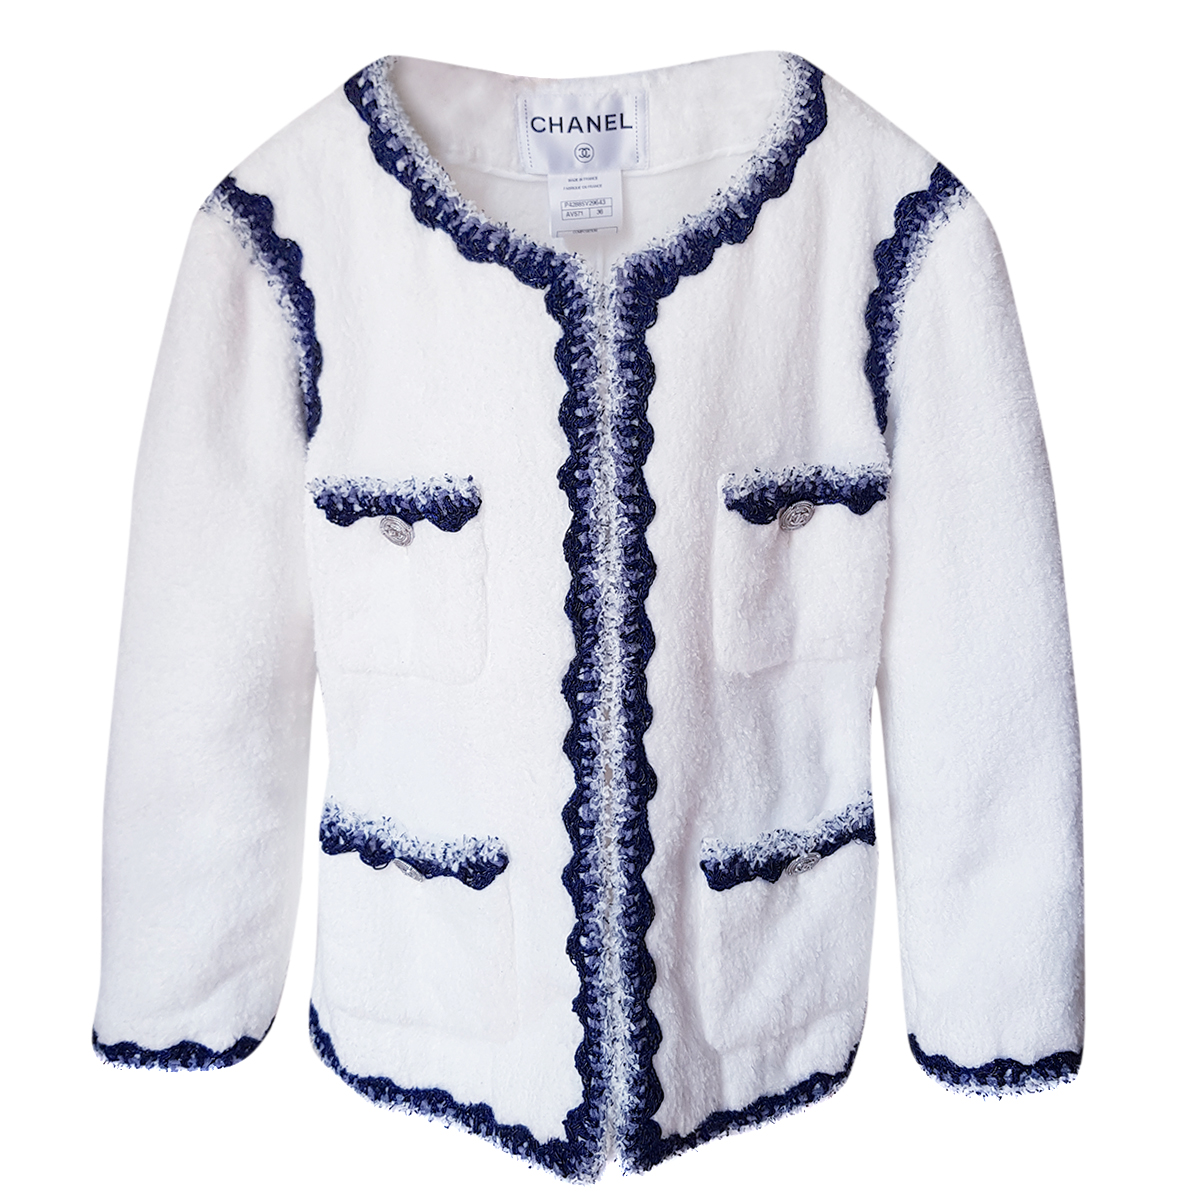 Chanel White Jacket W/ Blue Tweed Trim